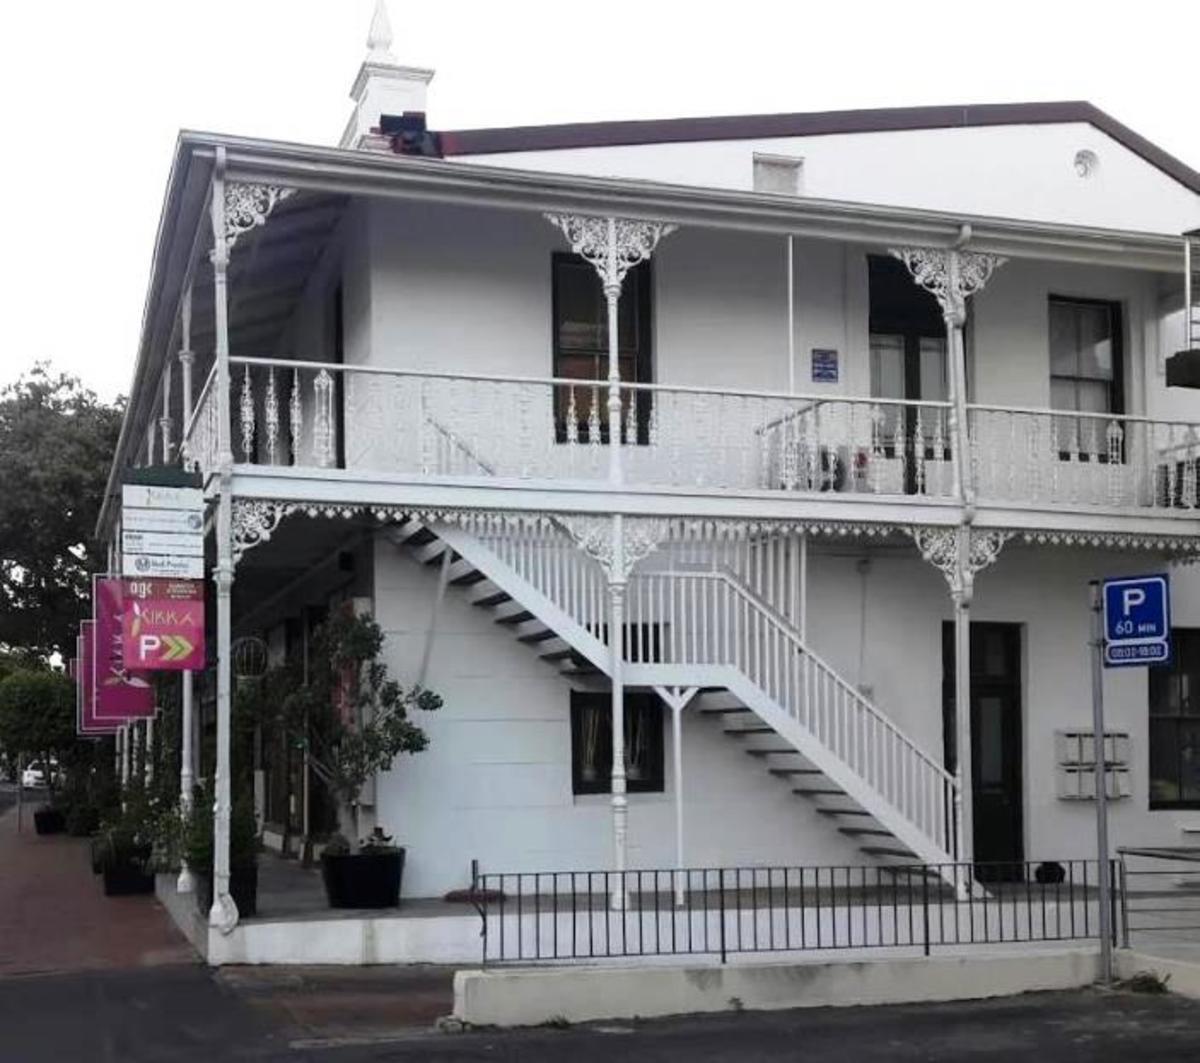 PM Cross Building, 215 Main Road, Paarl